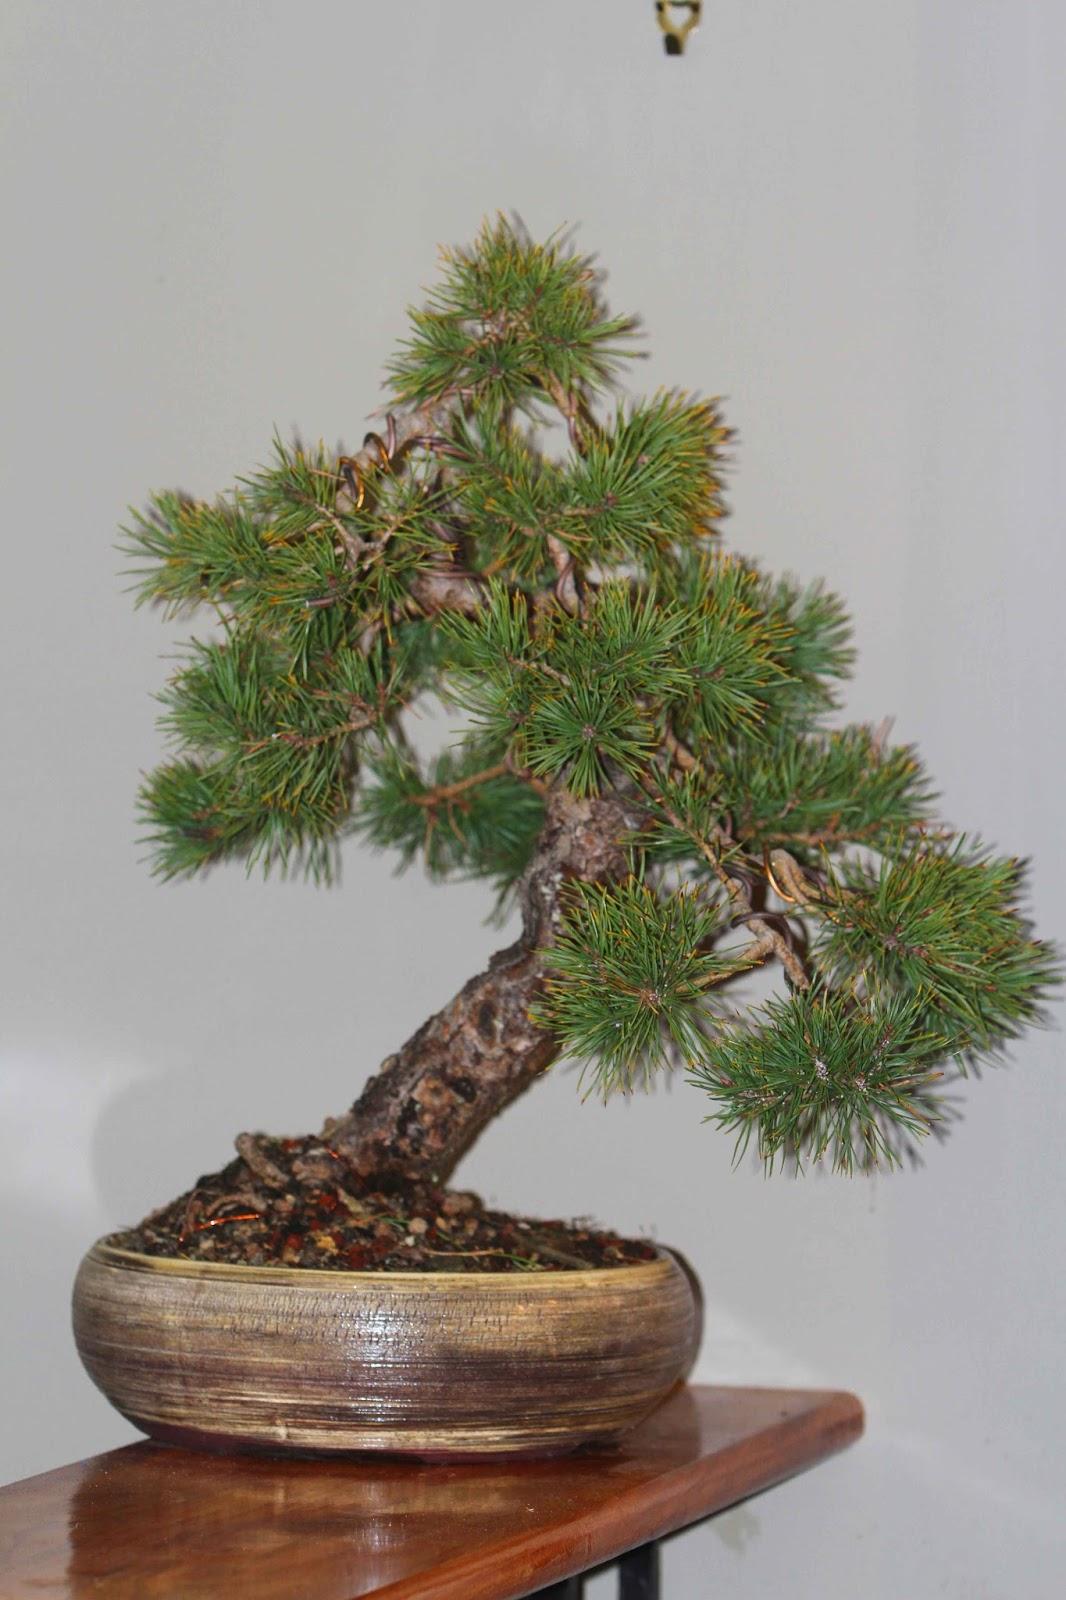 fionnas bonsai pots kiwi made in new zealand the